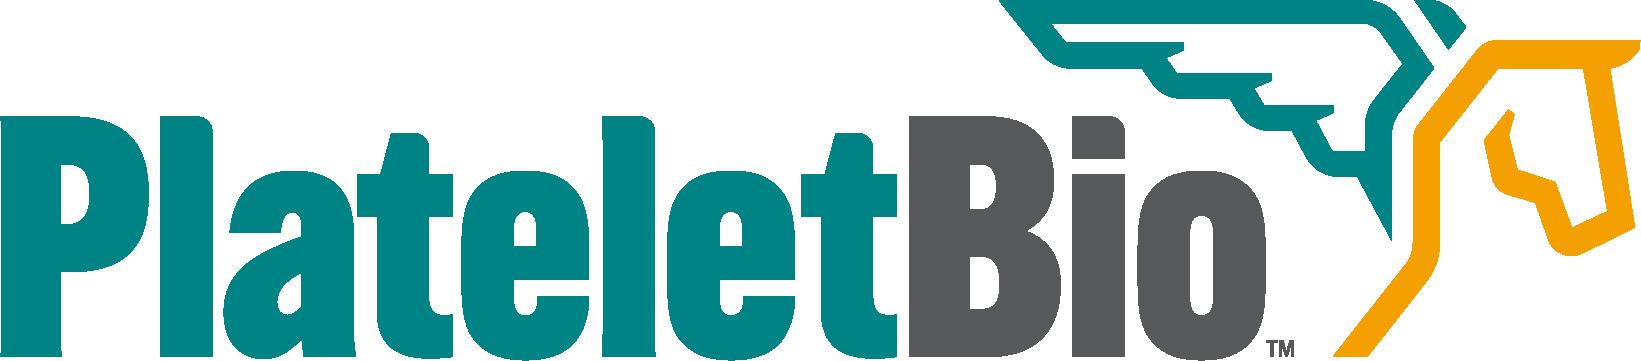 PlateletBio logo